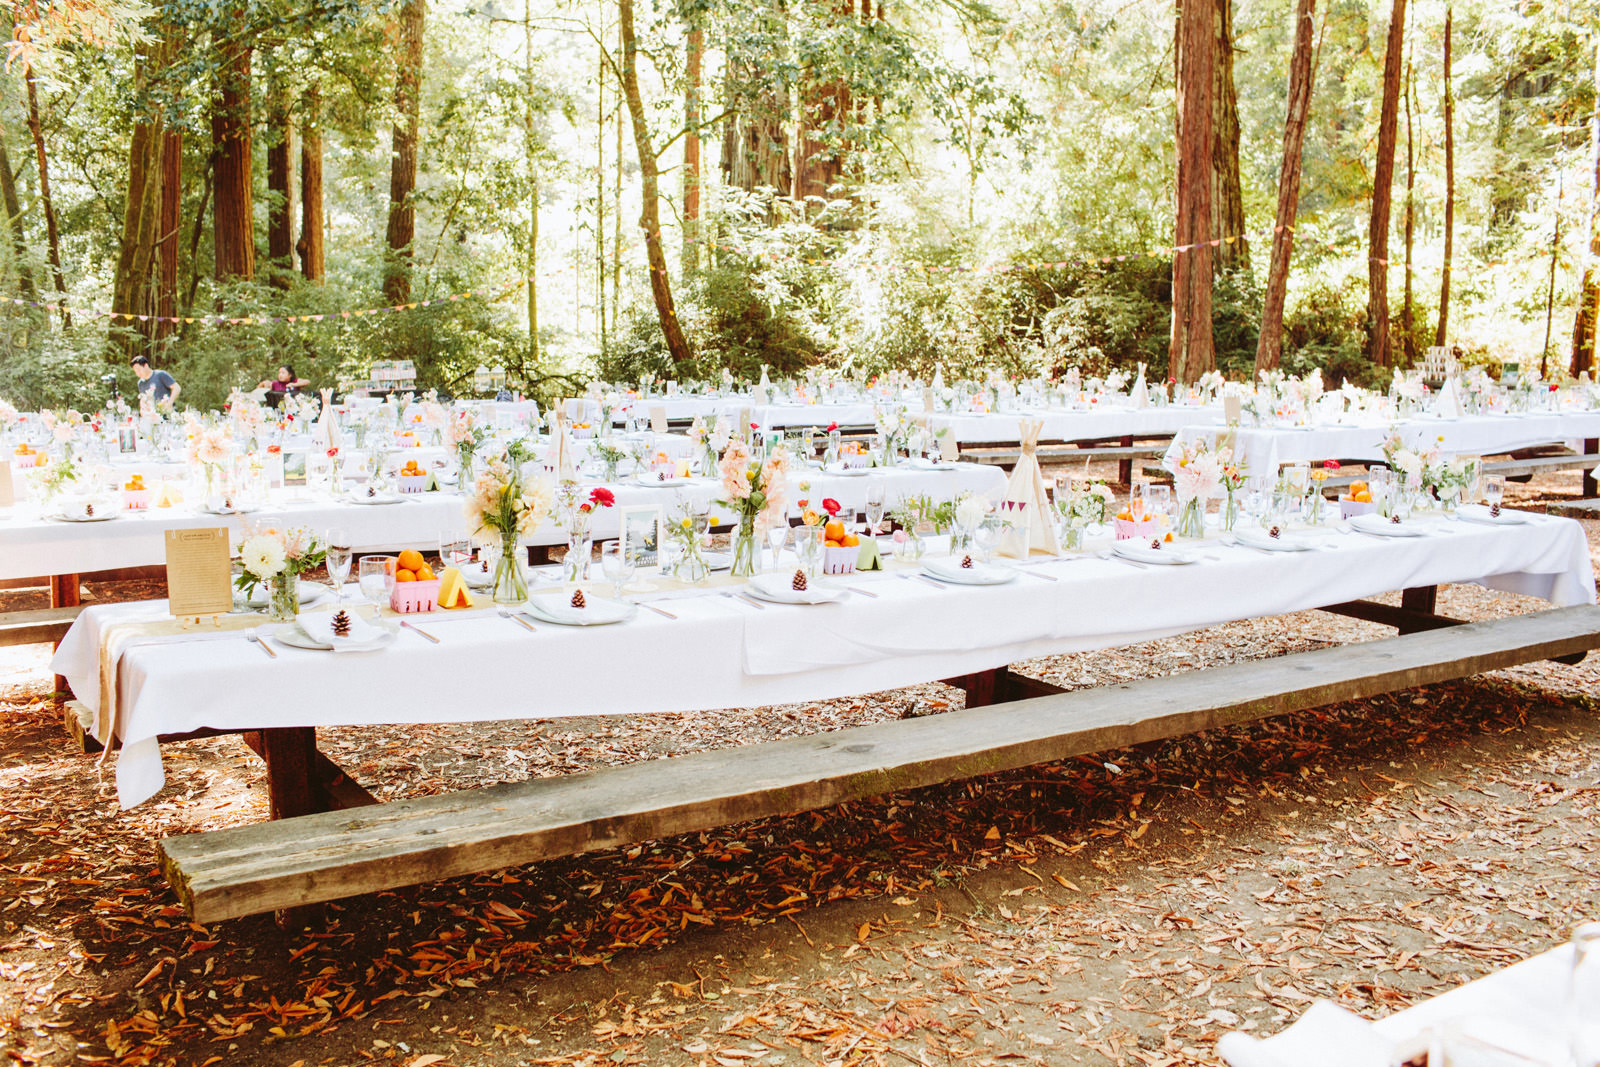 kimclay-blog-059 REDWOOD FOREST WEDDING